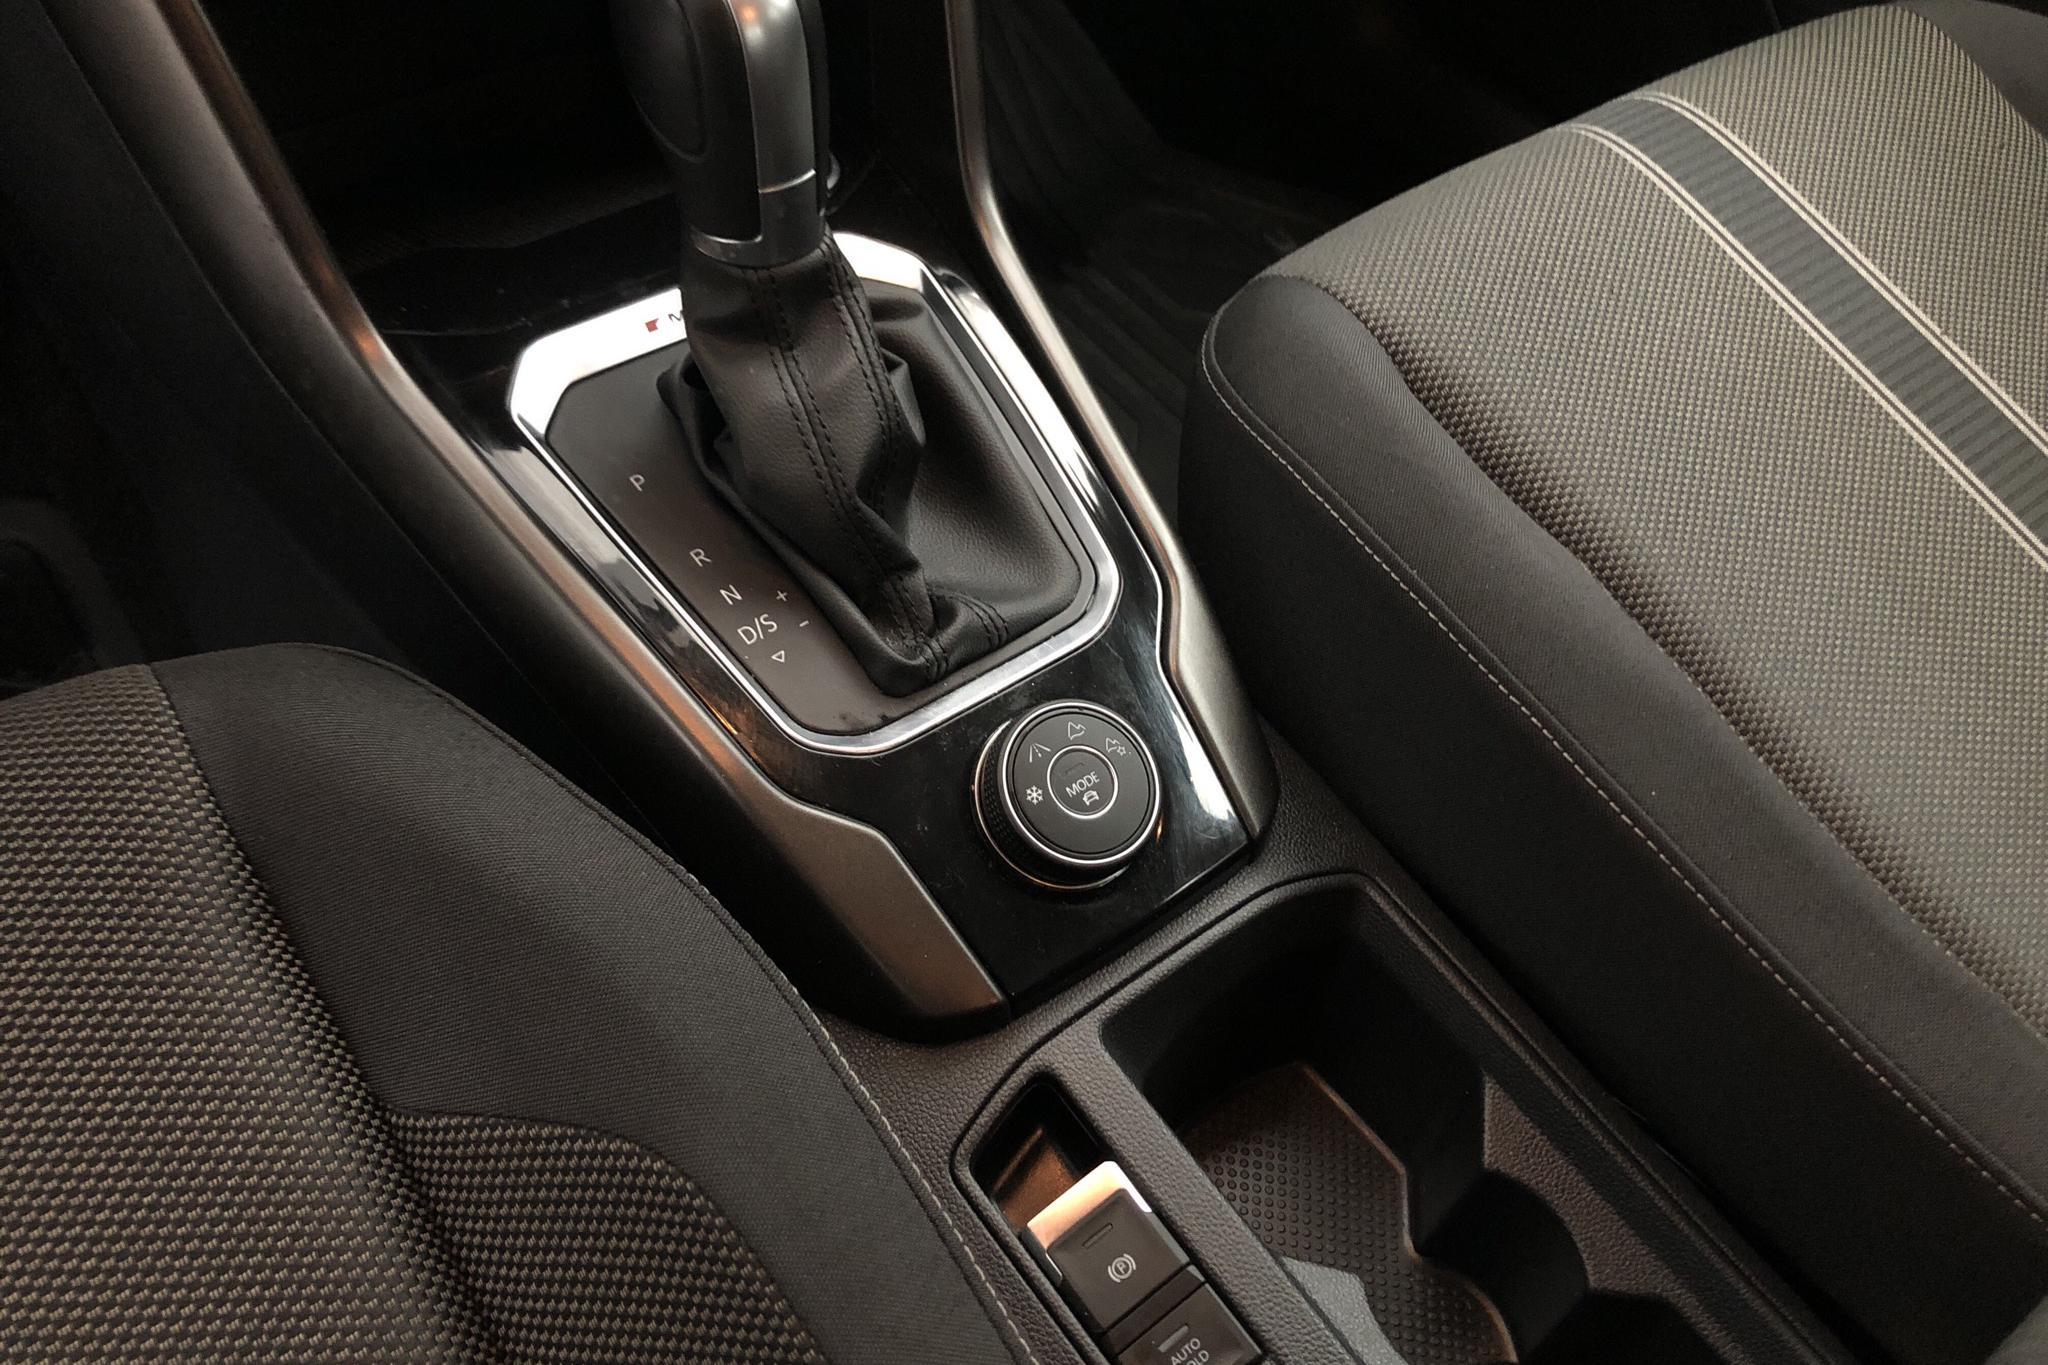 VW T-Roc 2.0 TSI 4MOTION (190hk) - 2 630 mil - Automat - grå - 2018